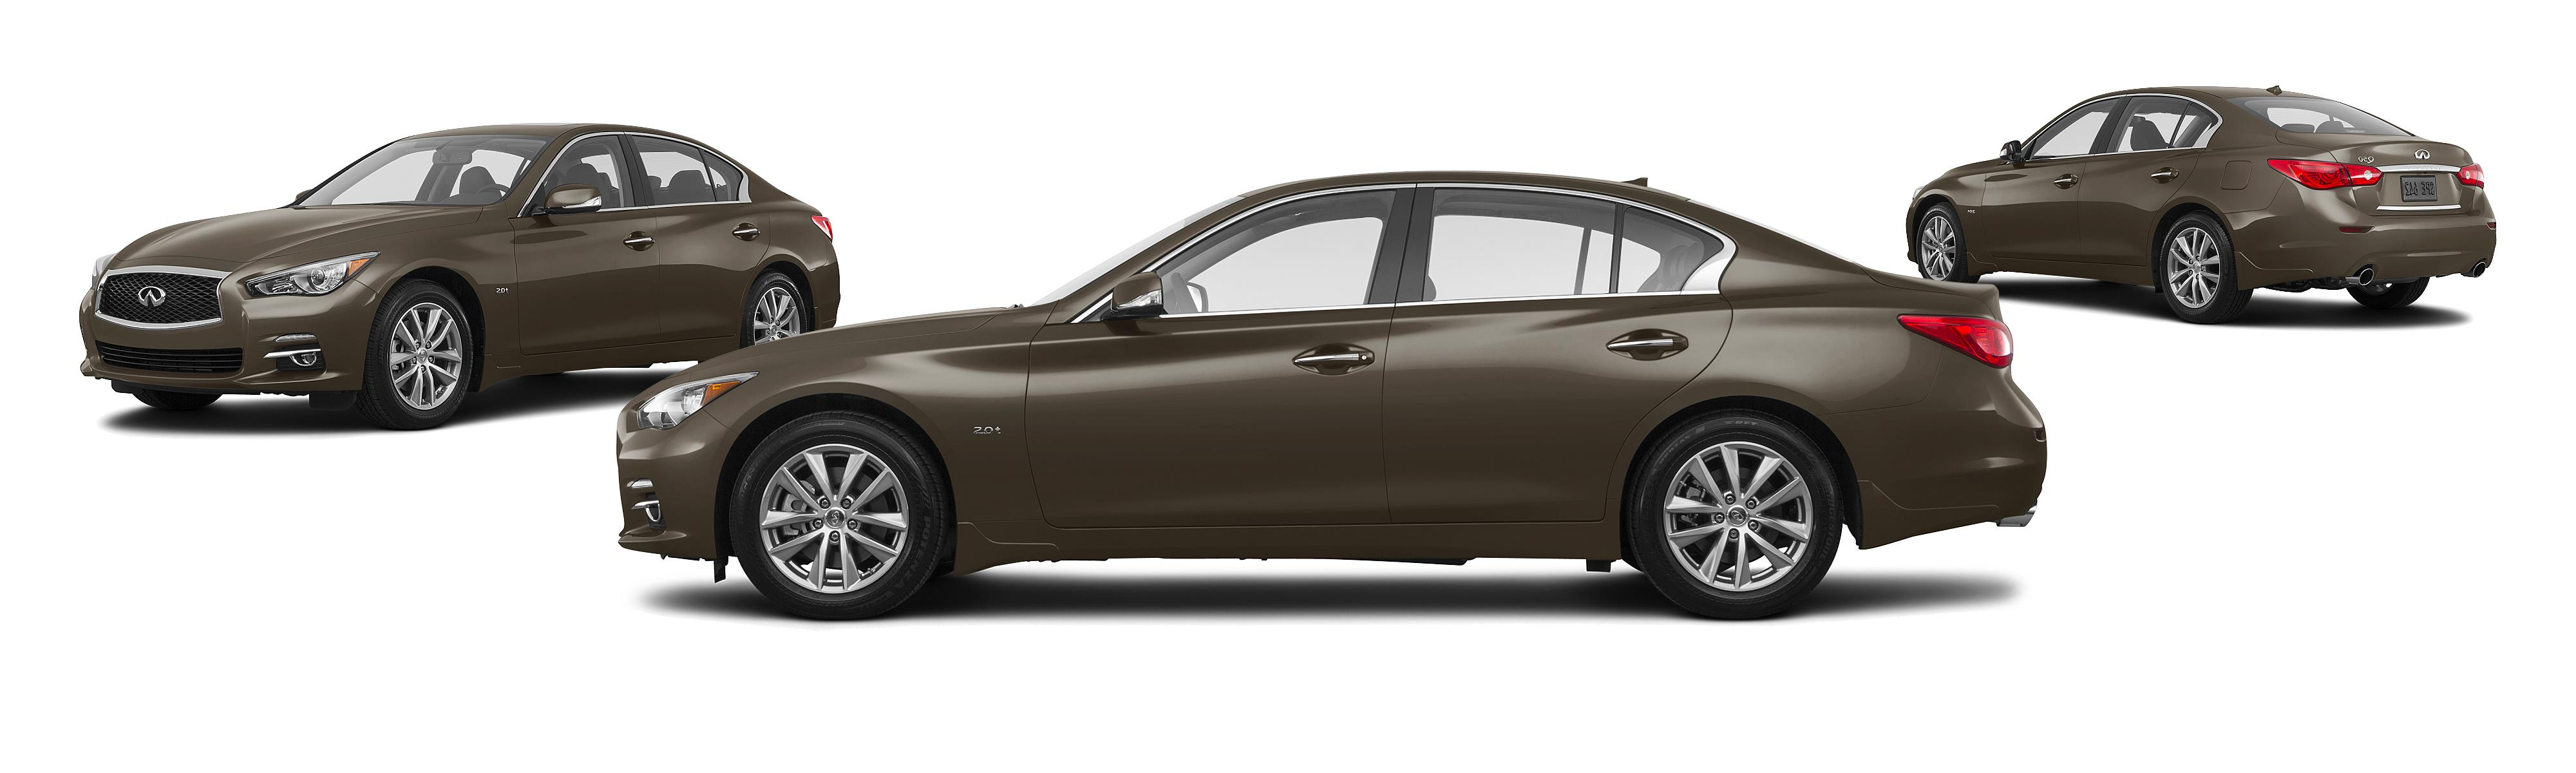 INFINITI Q Sport Dr Sedan Research GrooveCar - Infiniti q50 invoice price